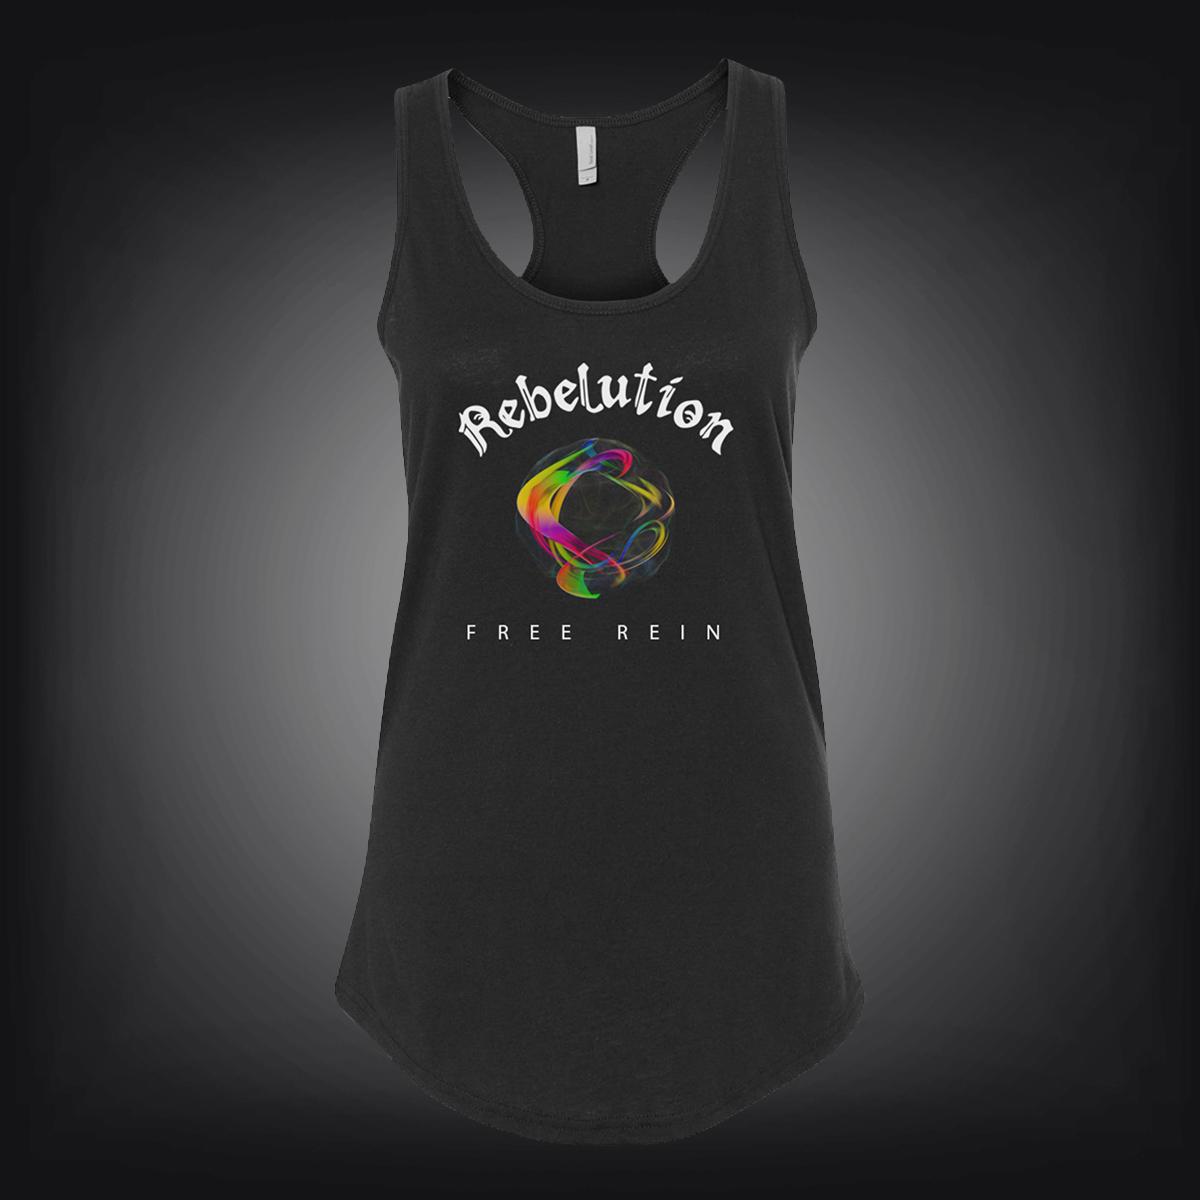 Rebelution: Free Rein Women's Album Tee